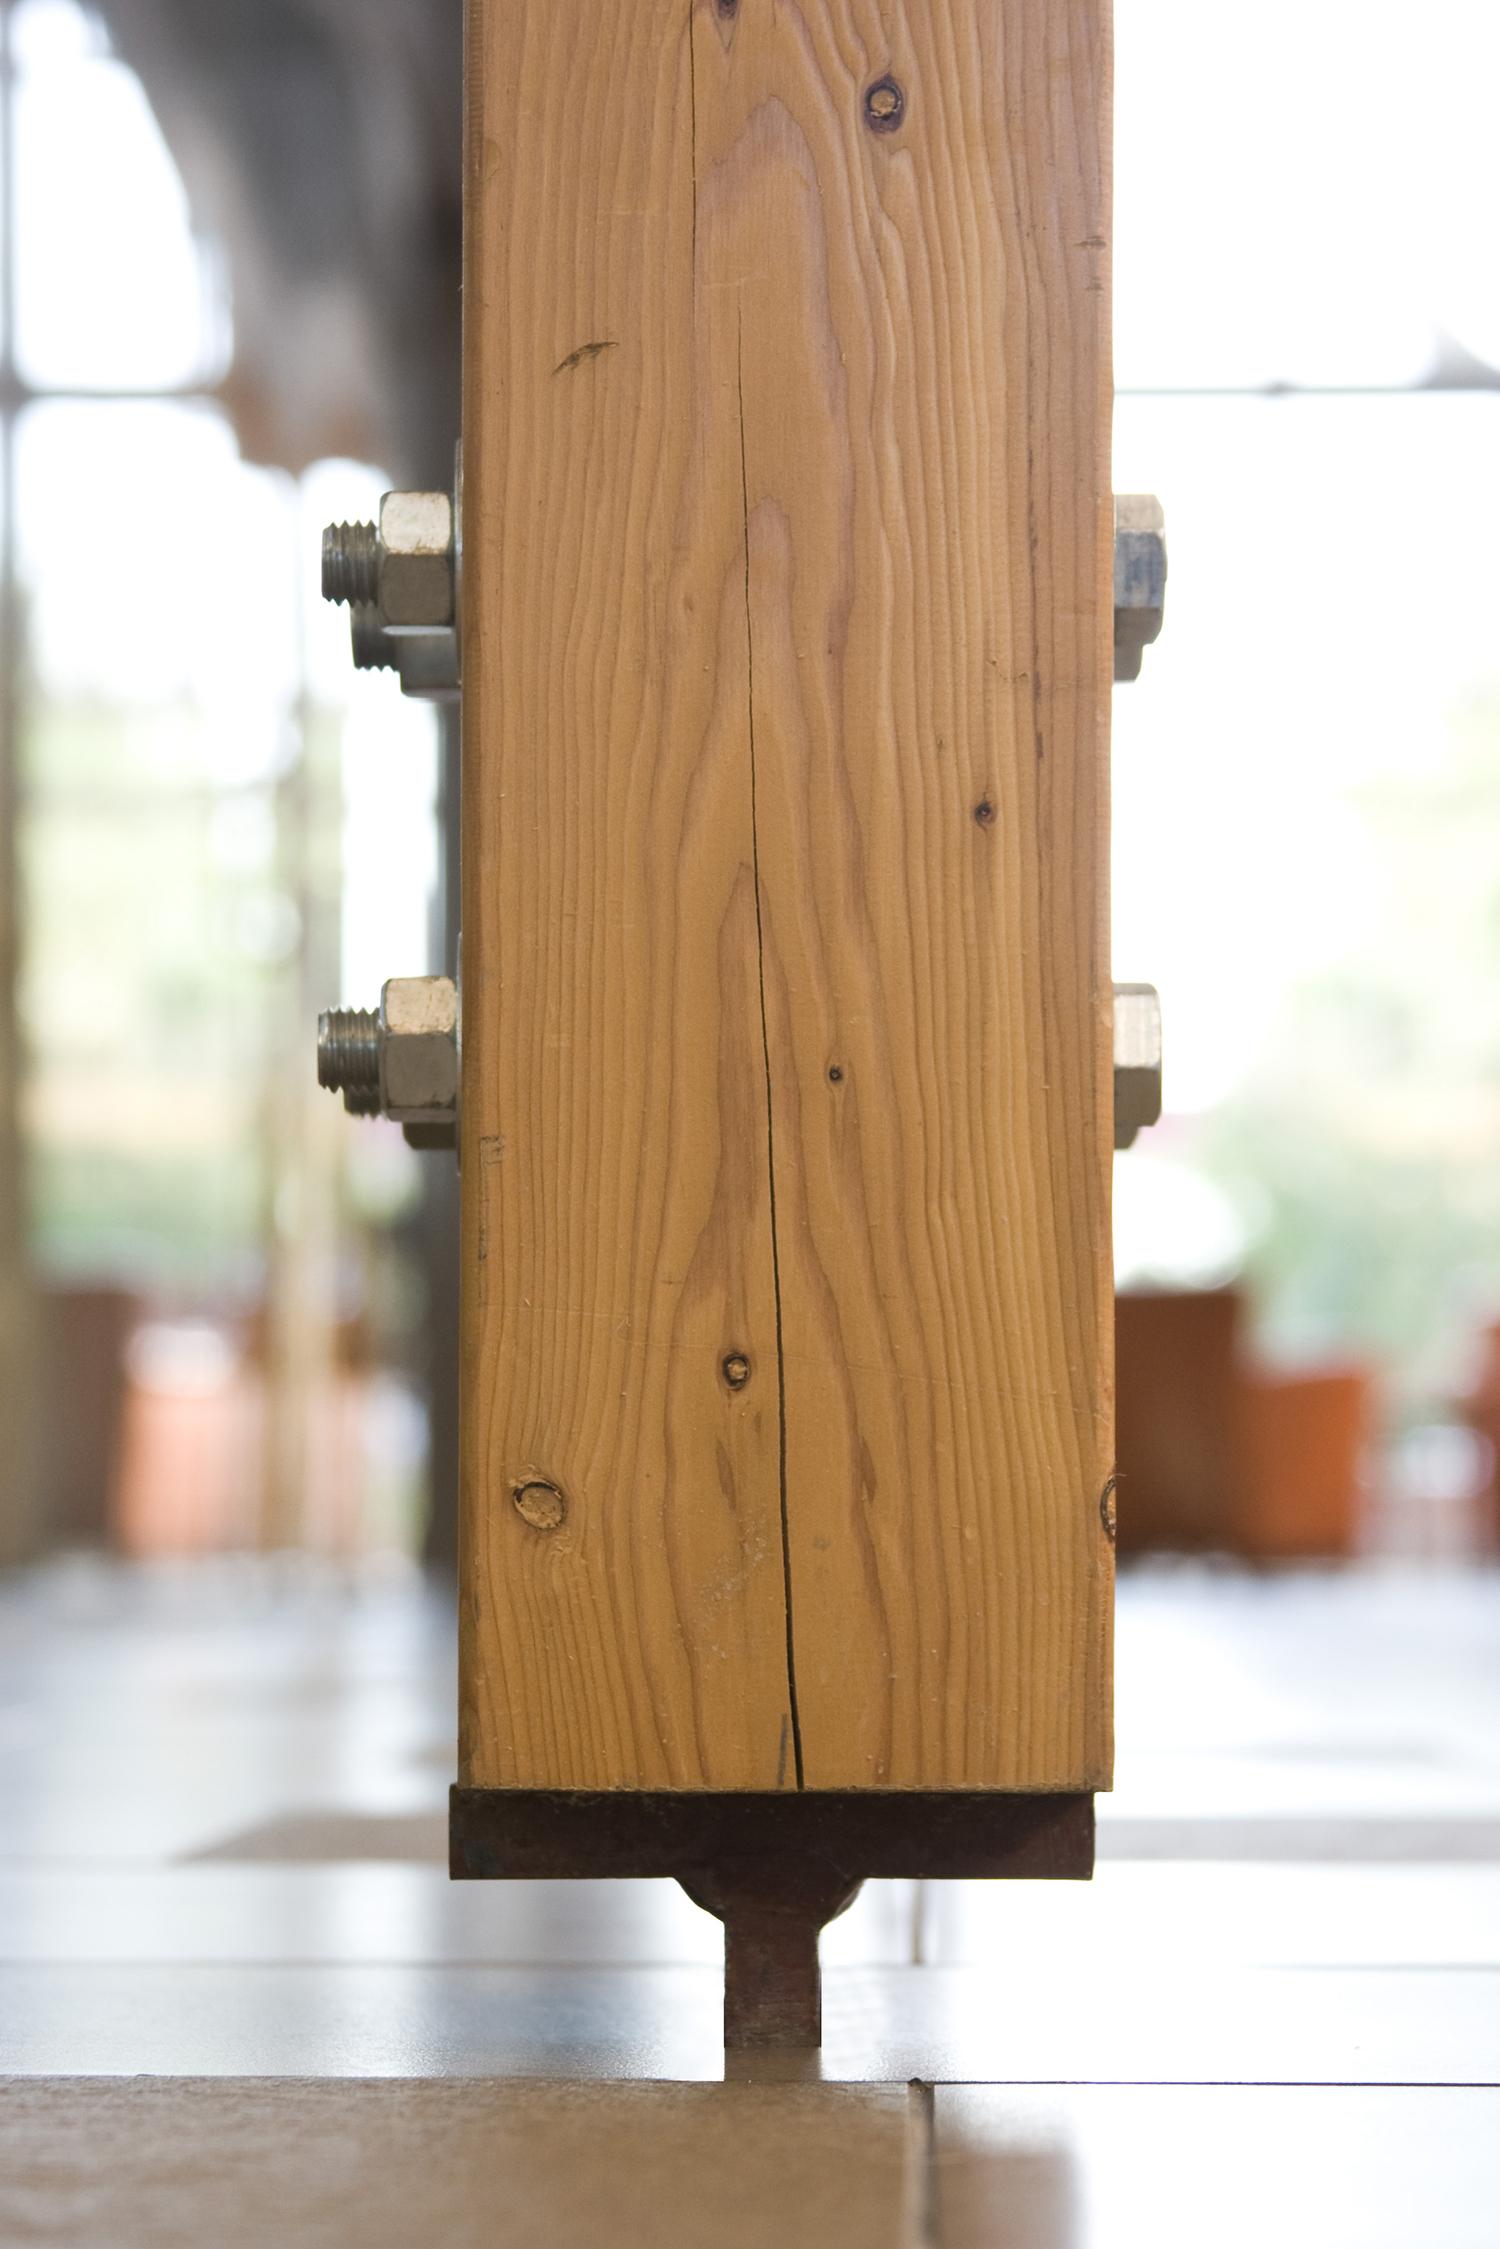 Sunova Credit Union, interior photo of glulam beam / Photo: Tracy A Wieler